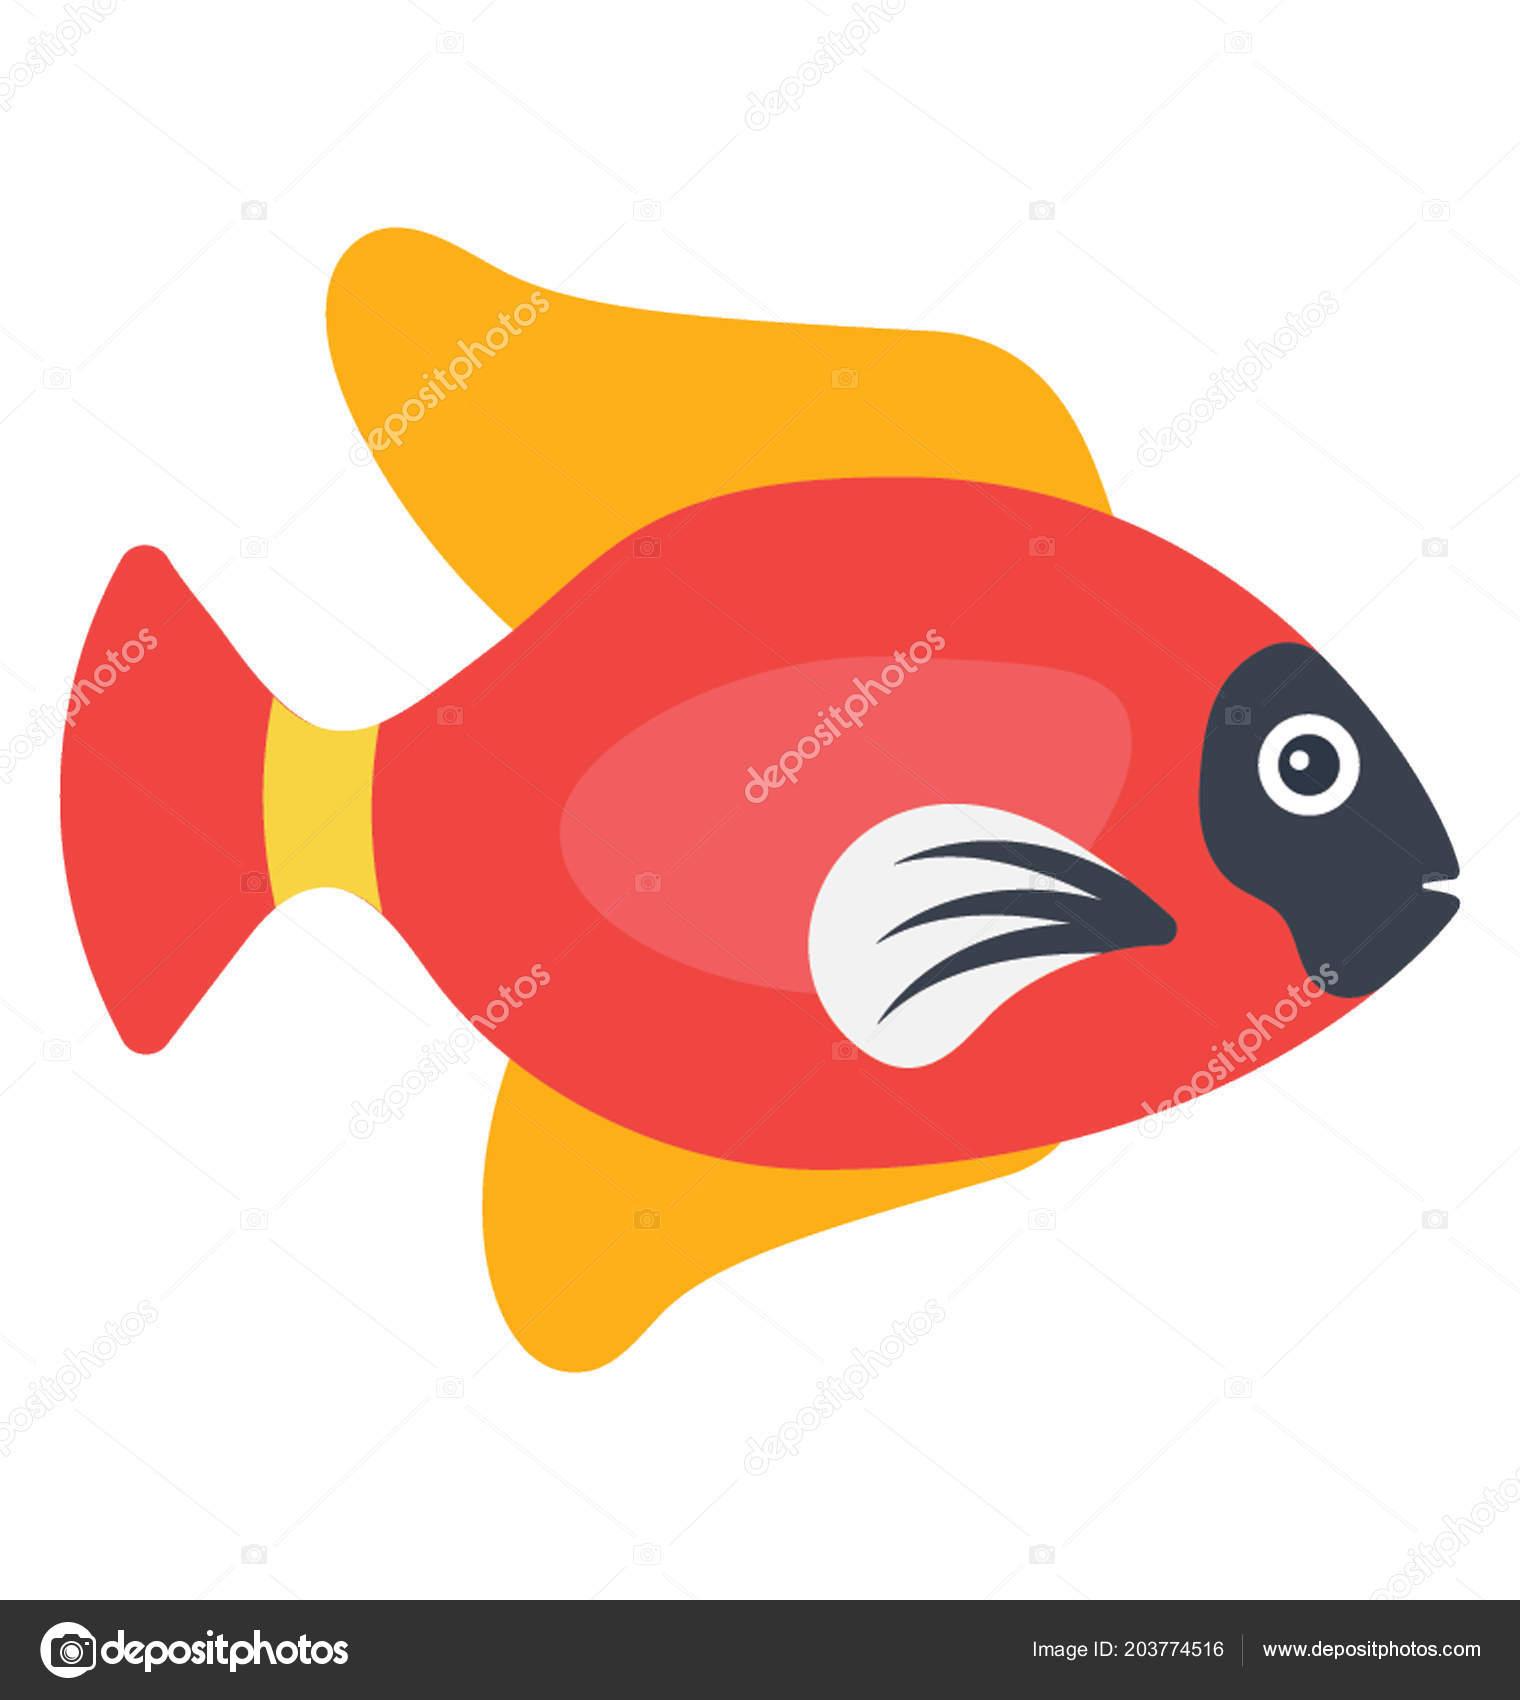 Red Colored Aquarium Pet Fish Orange Fins Characterizing Tropical ...